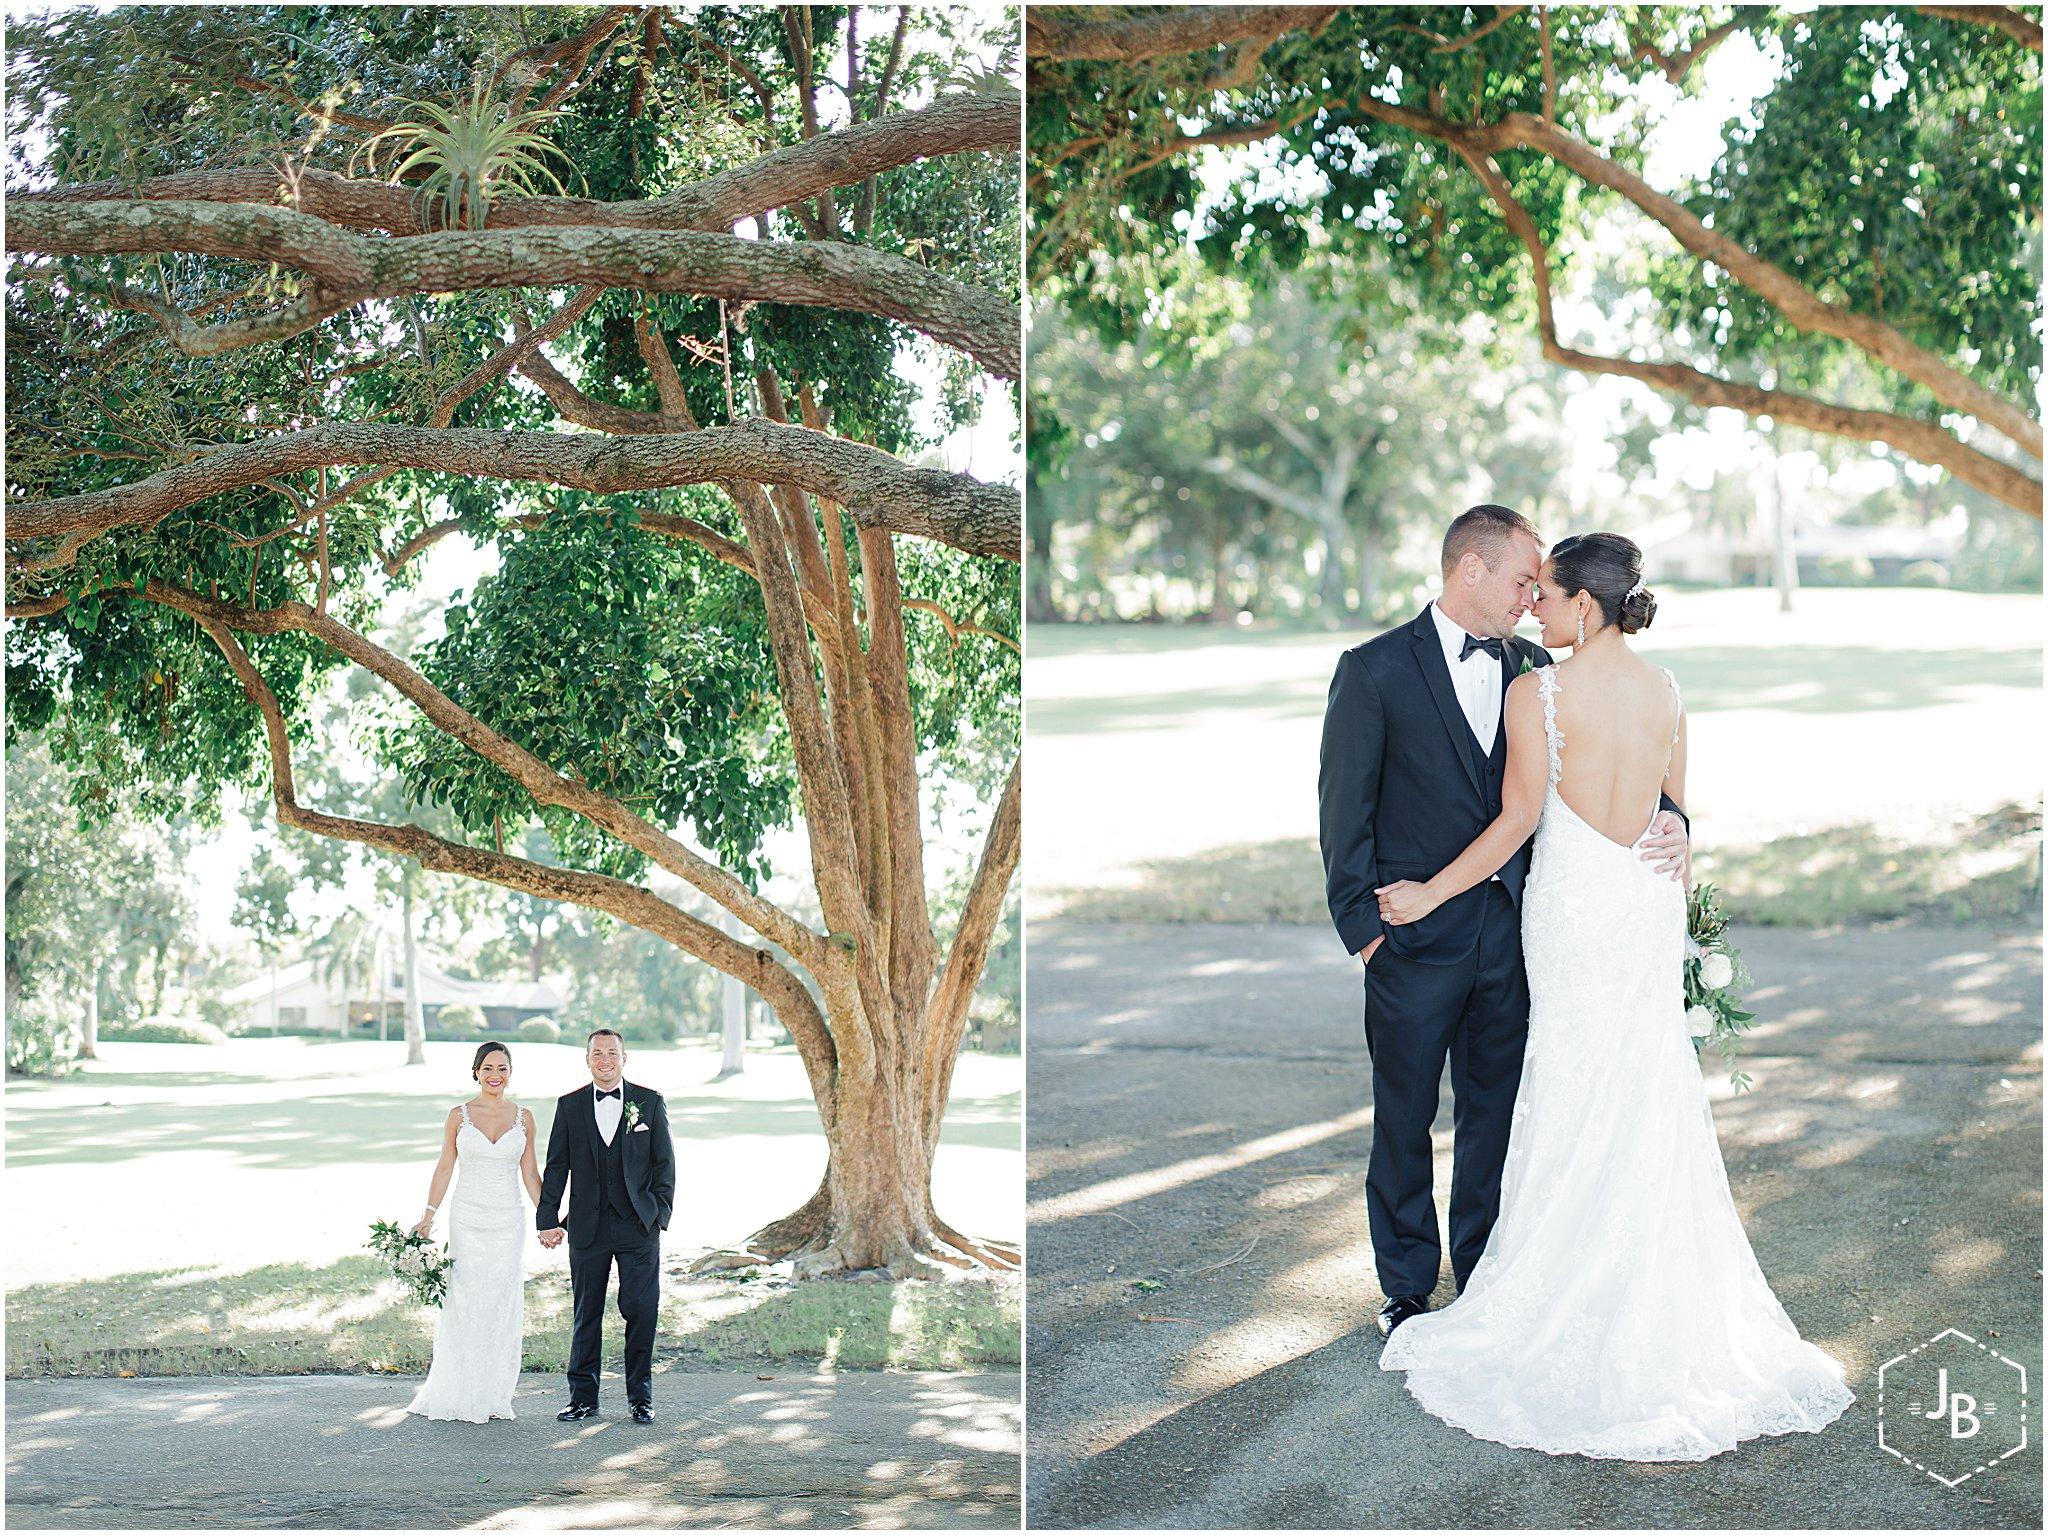 WeddingandEngagementFloridaPhotographer_0251.jpg